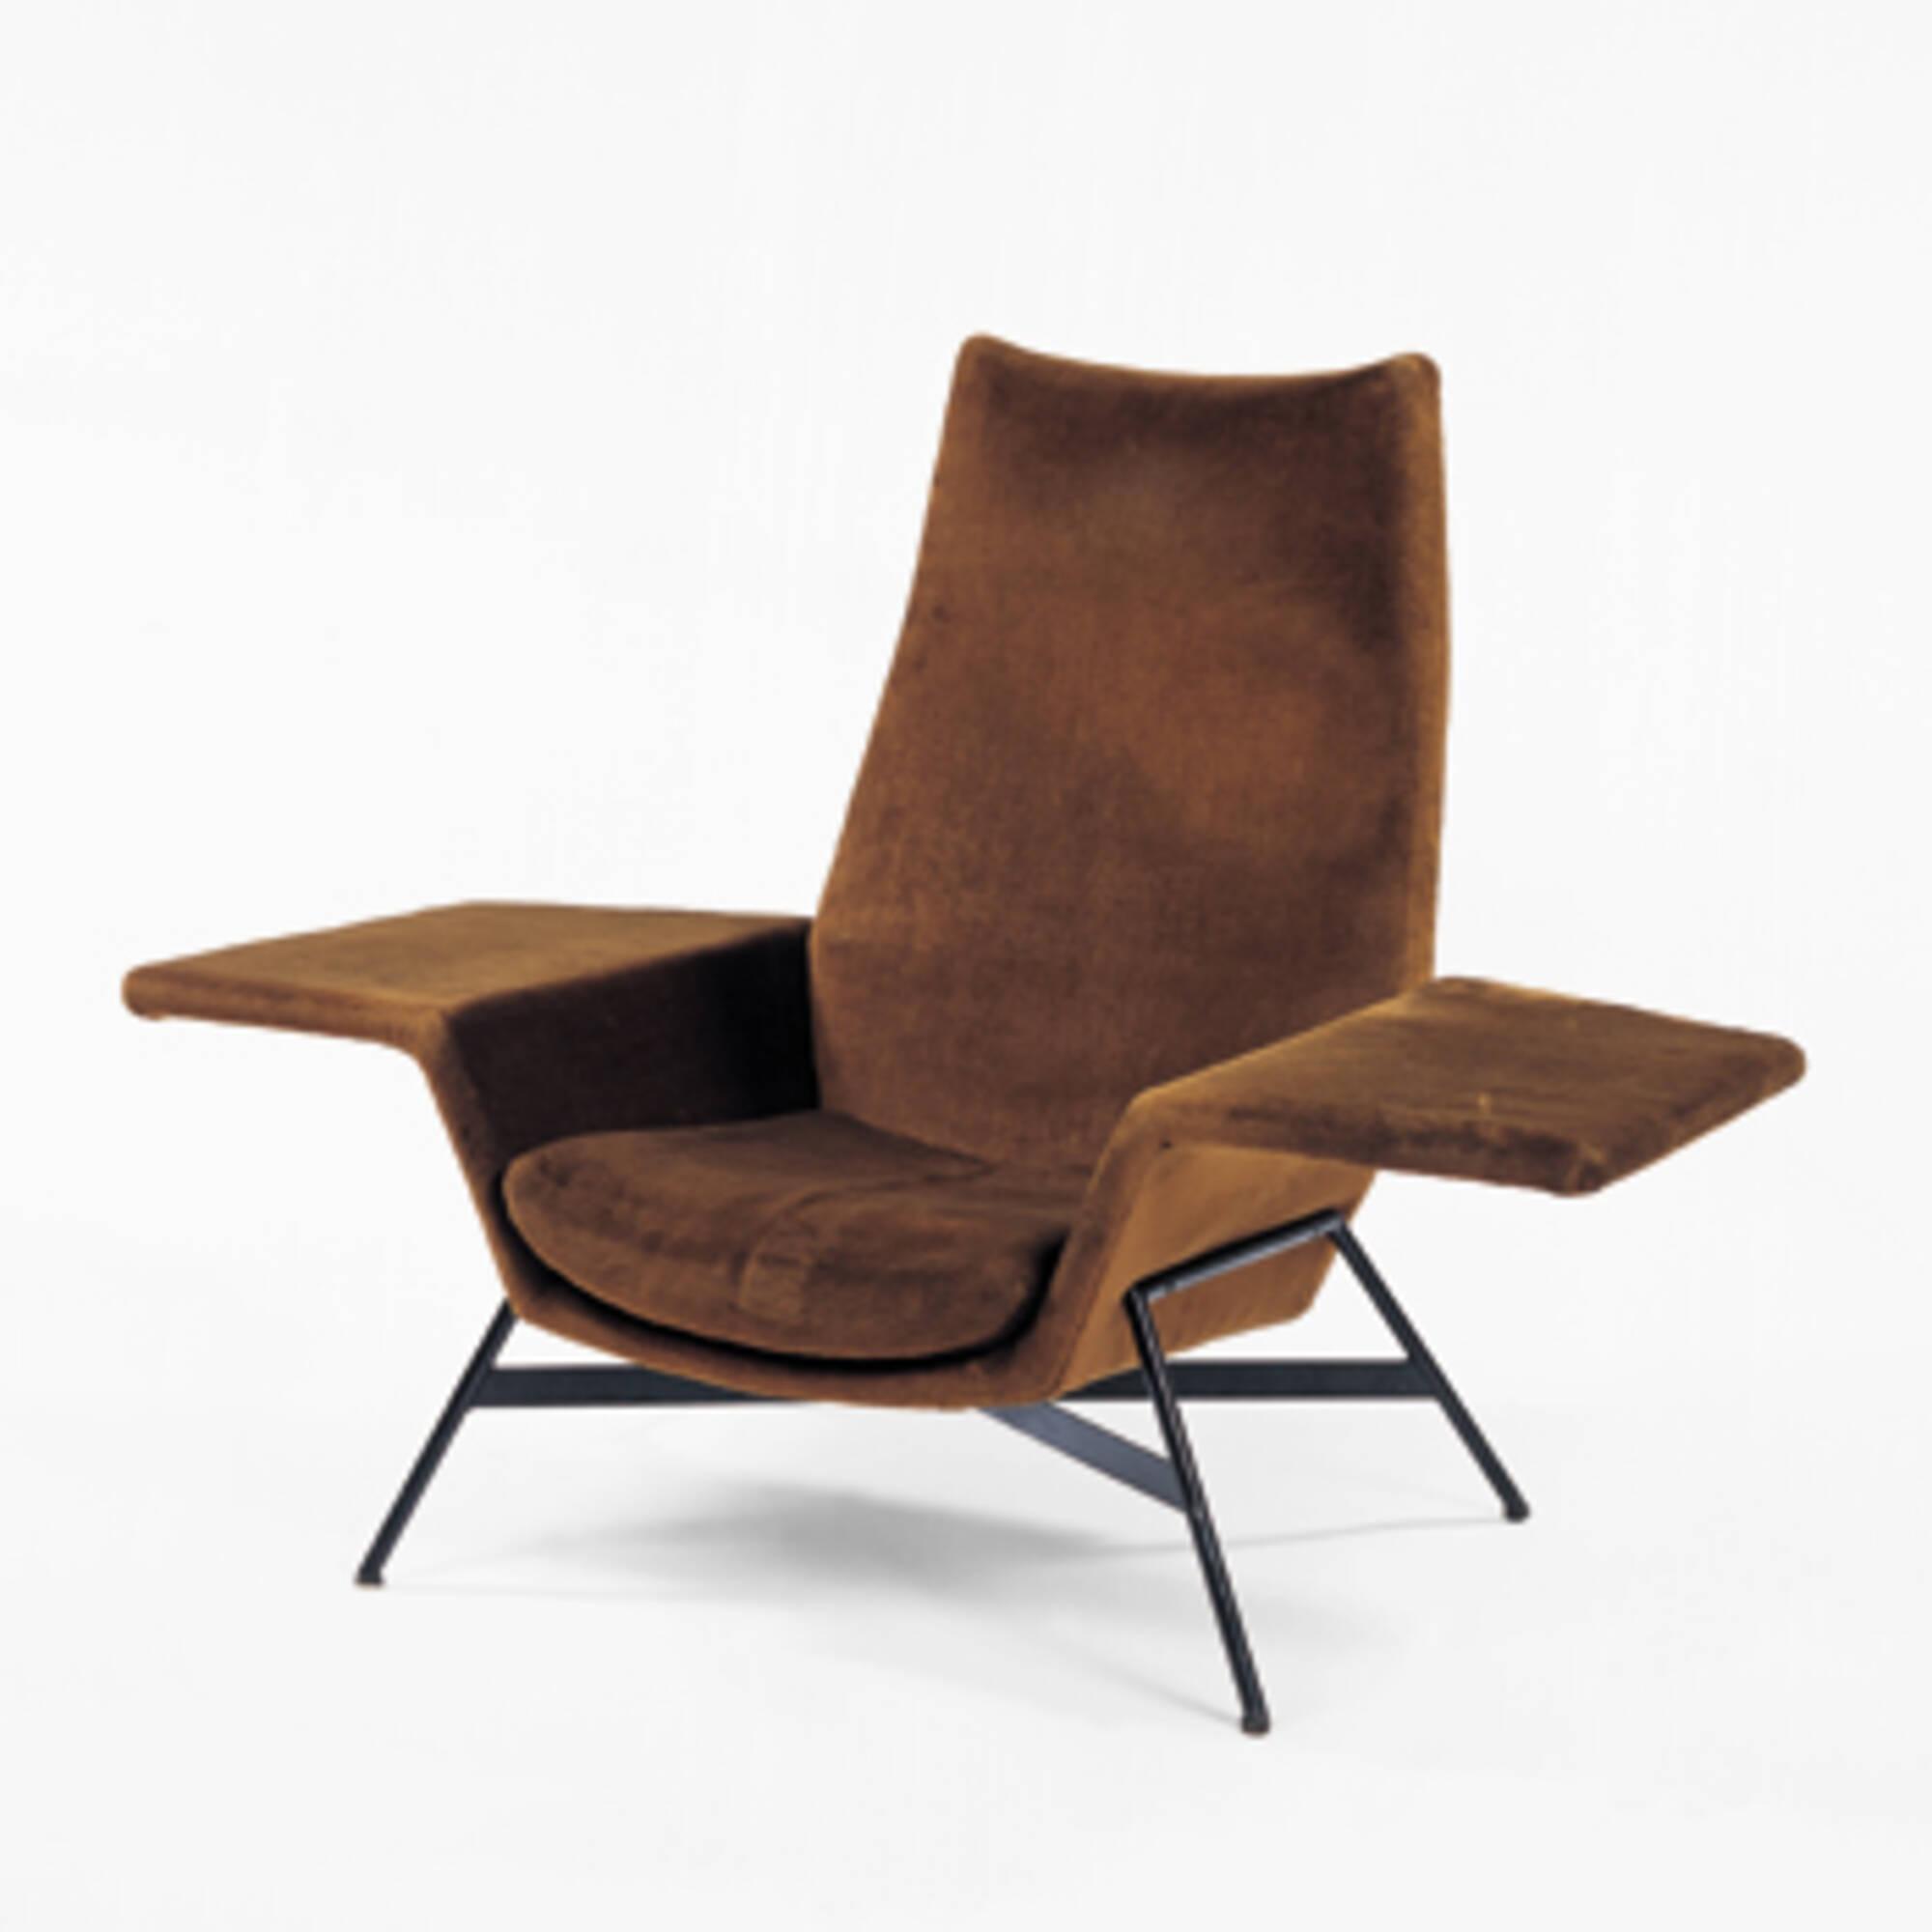 Sensational 692 European Lounge Chair 20Th Century Art Design 28 Alphanode Cool Chair Designs And Ideas Alphanodeonline